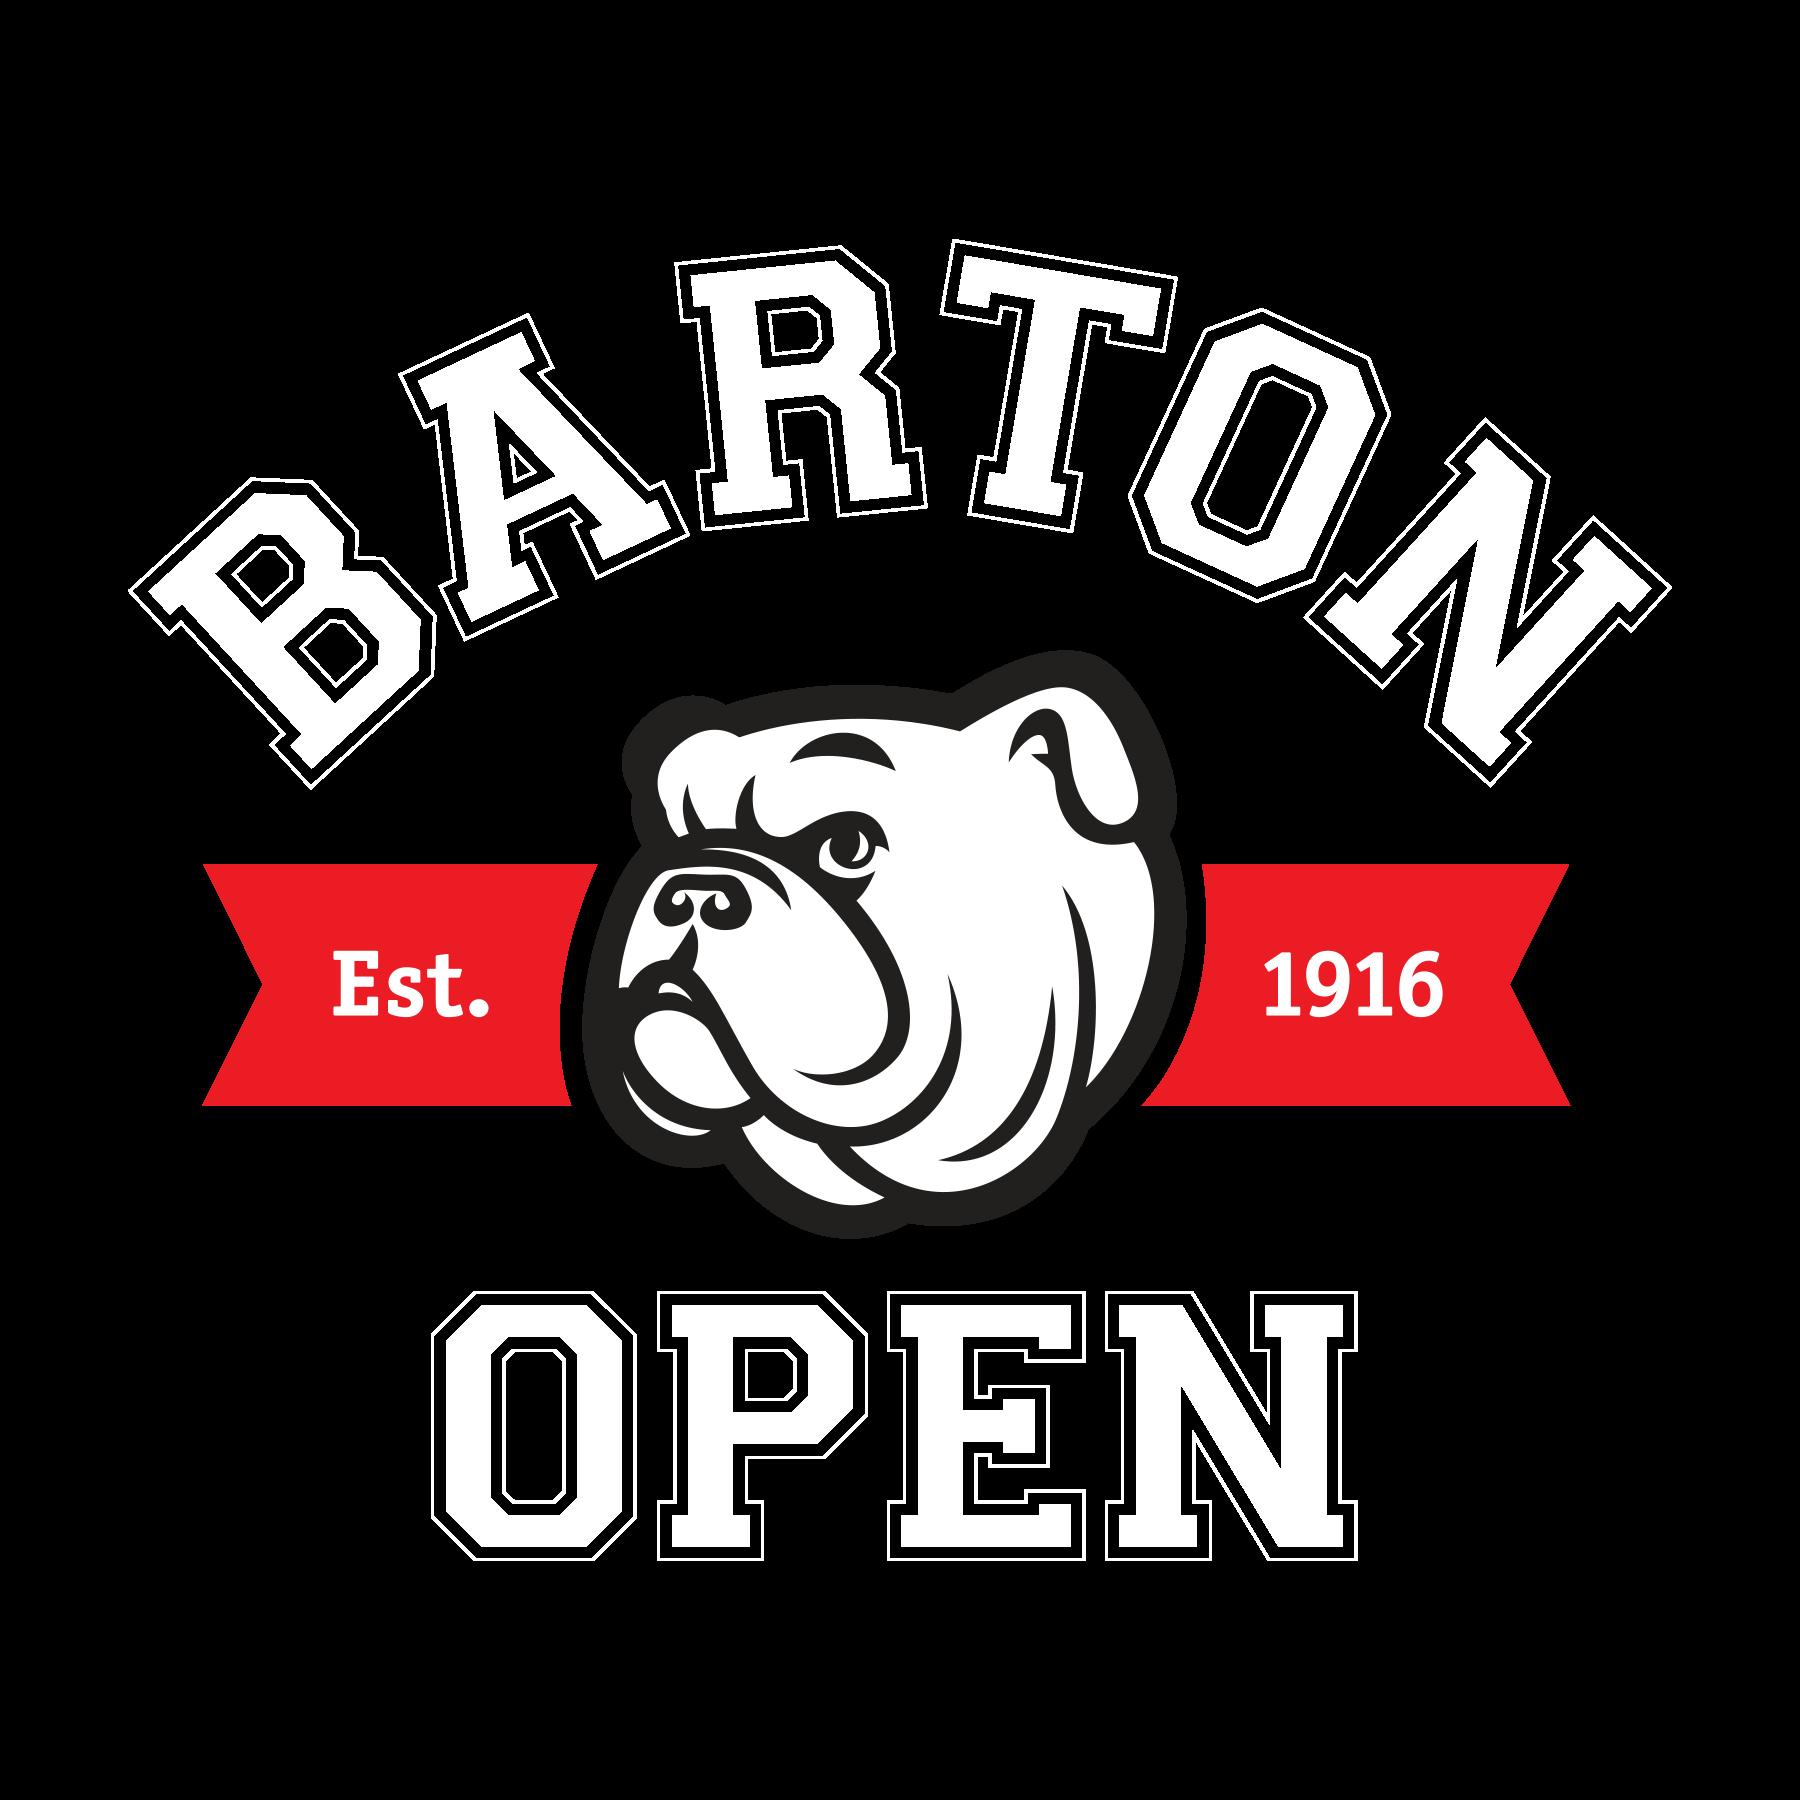 BartonOpen_Bulldog_Rev white.png